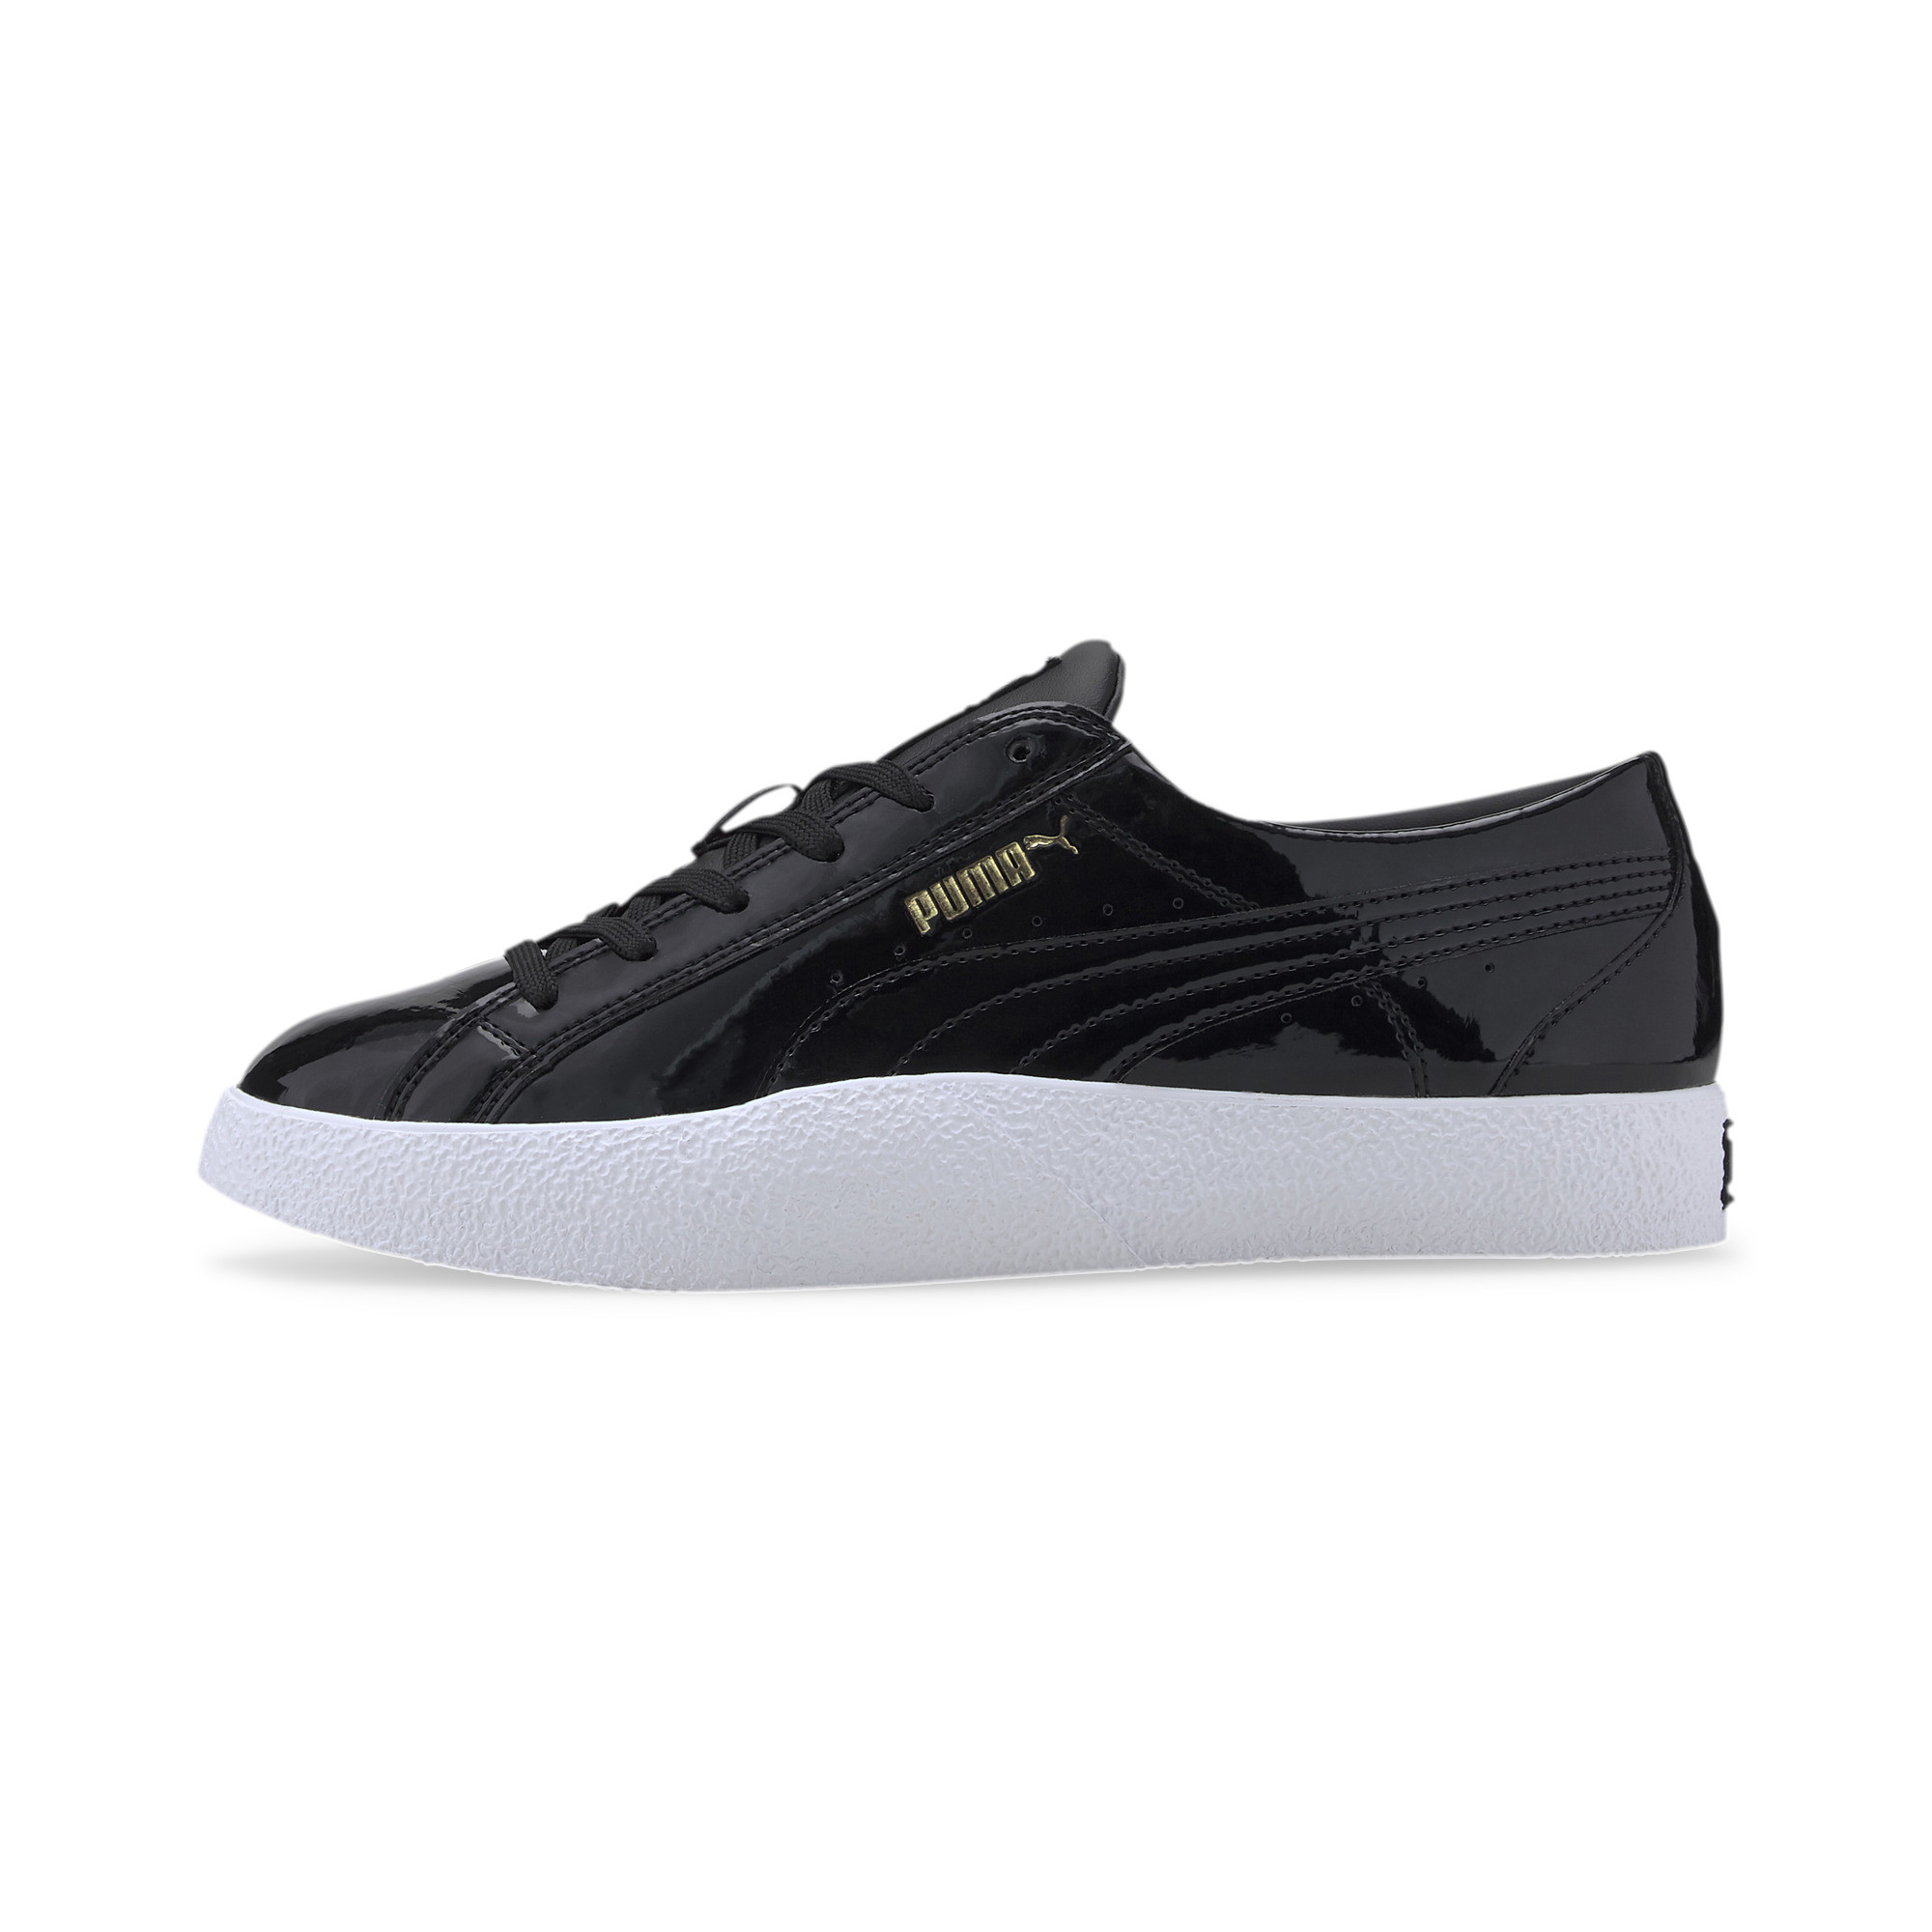 PUMA-Women-039-s-Love-Patent-Sneakers thumbnail 4